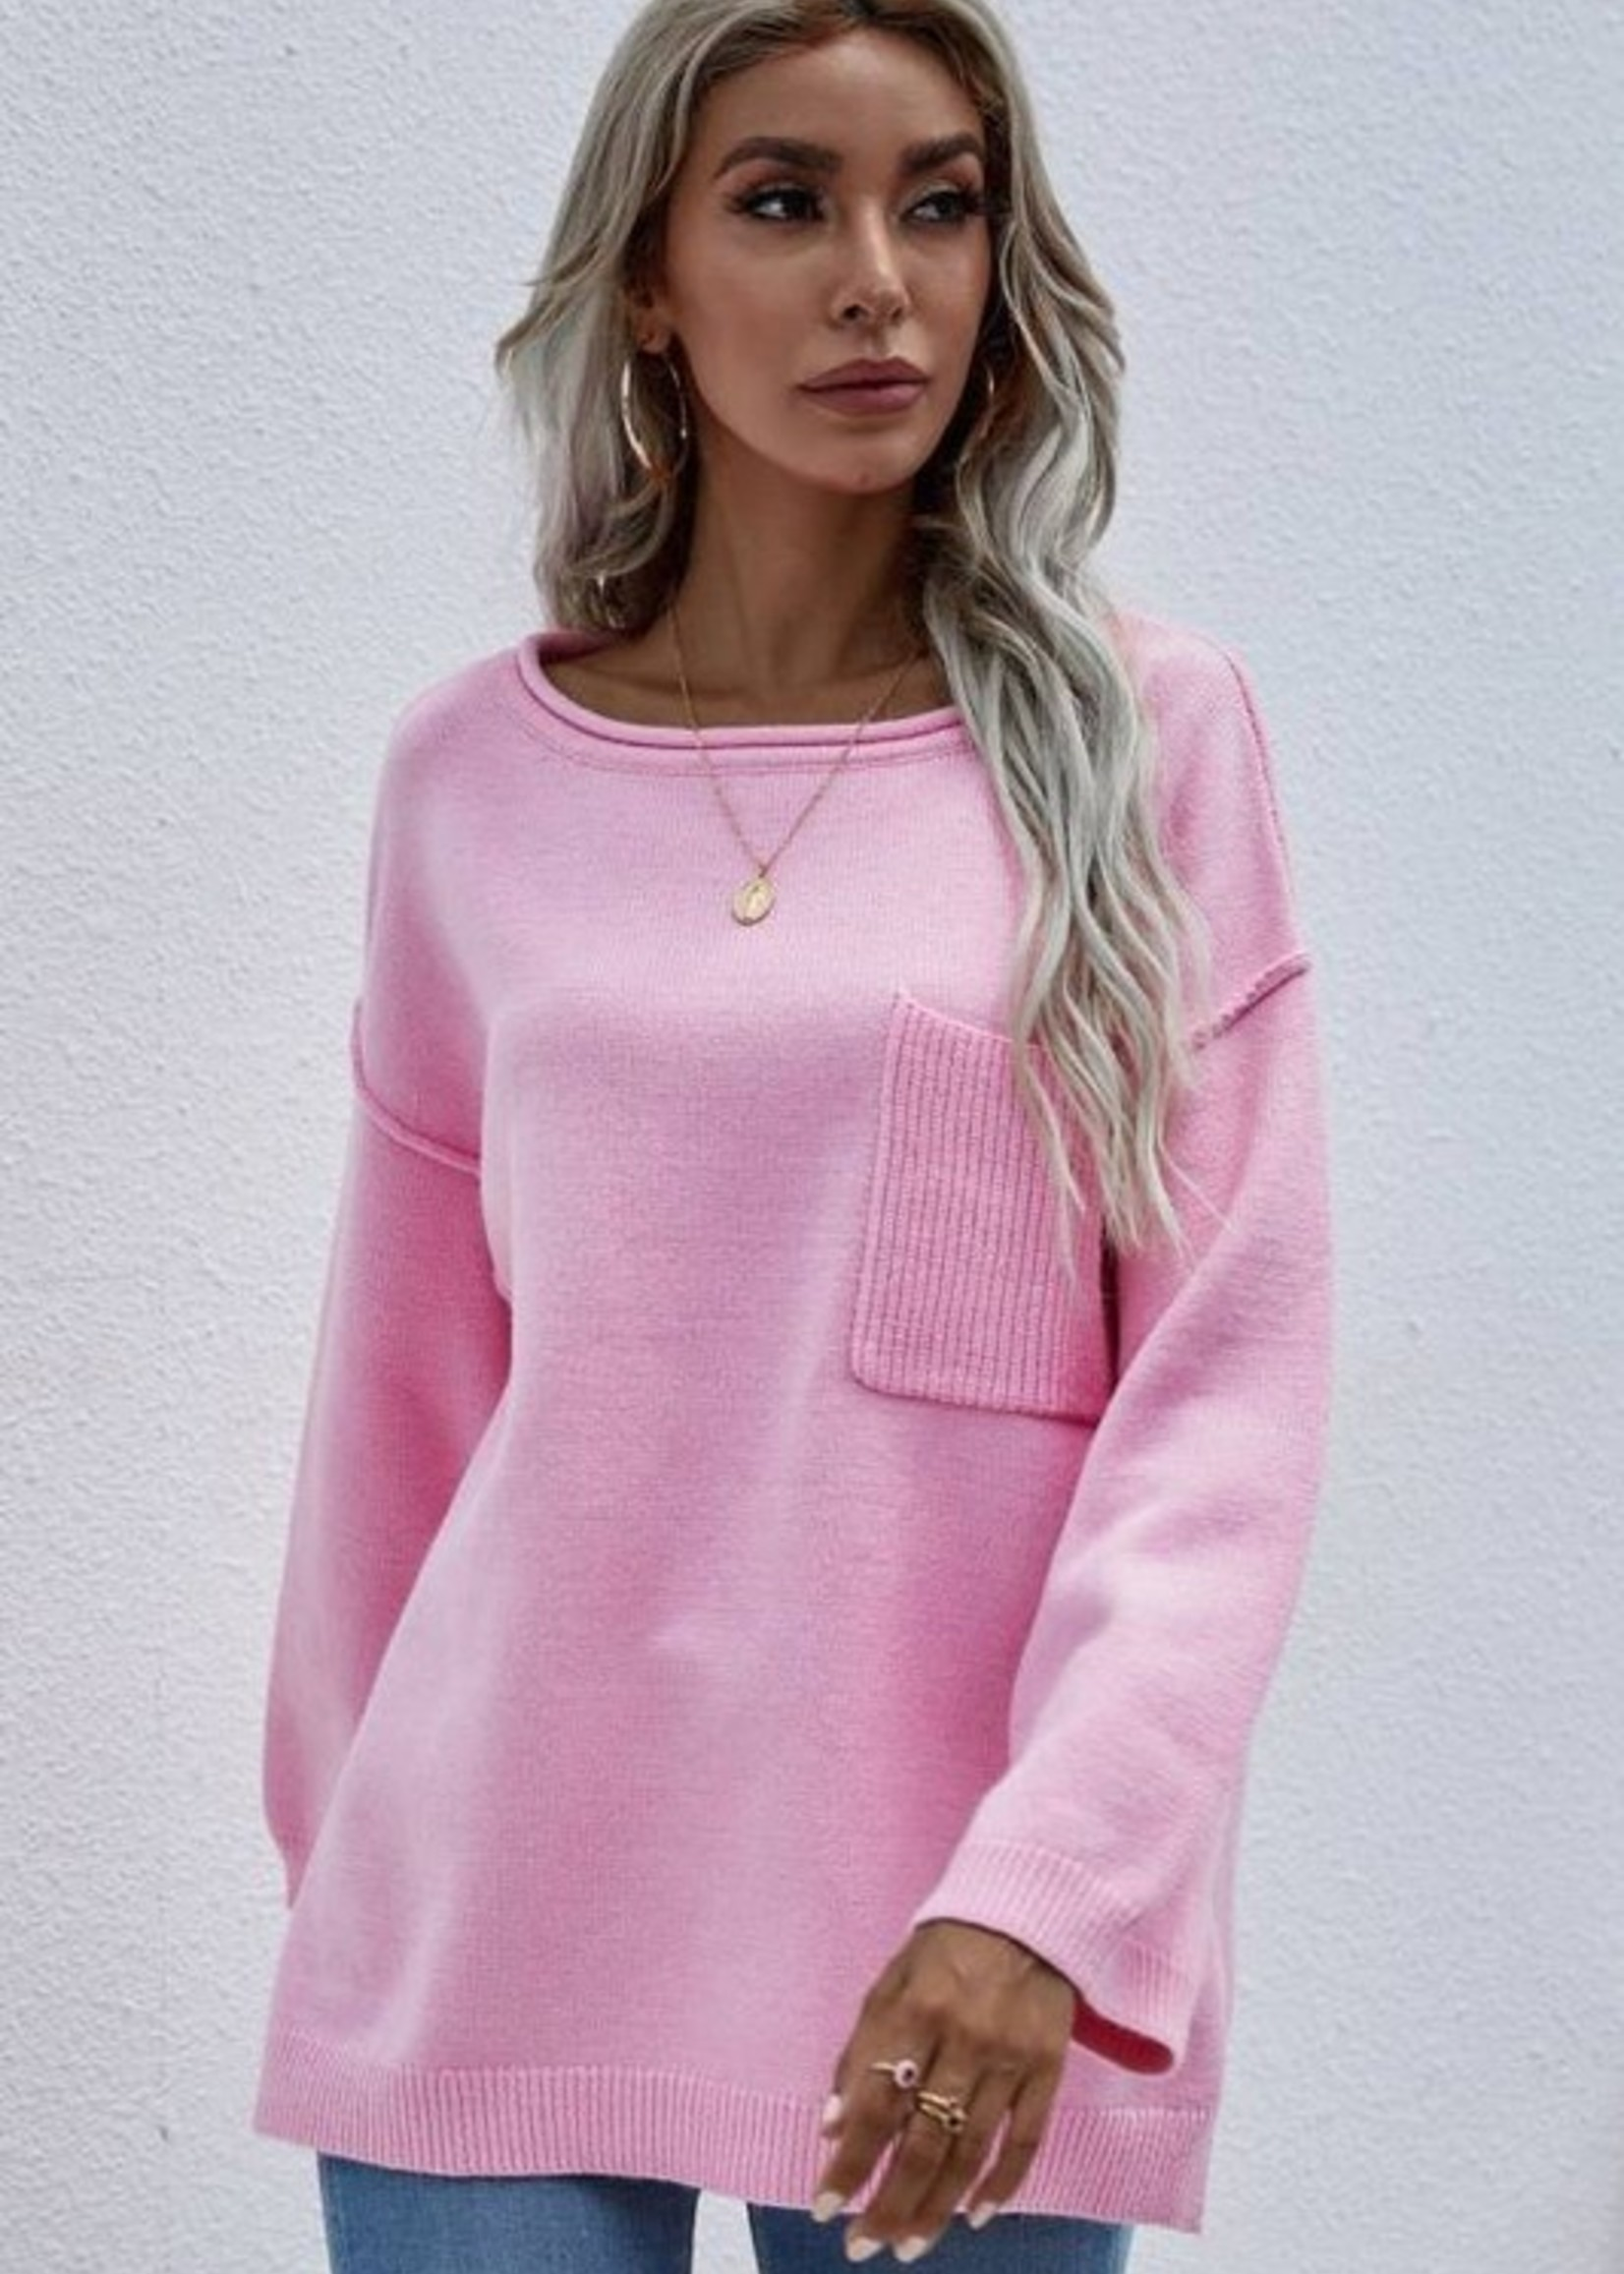 One pocket sweater